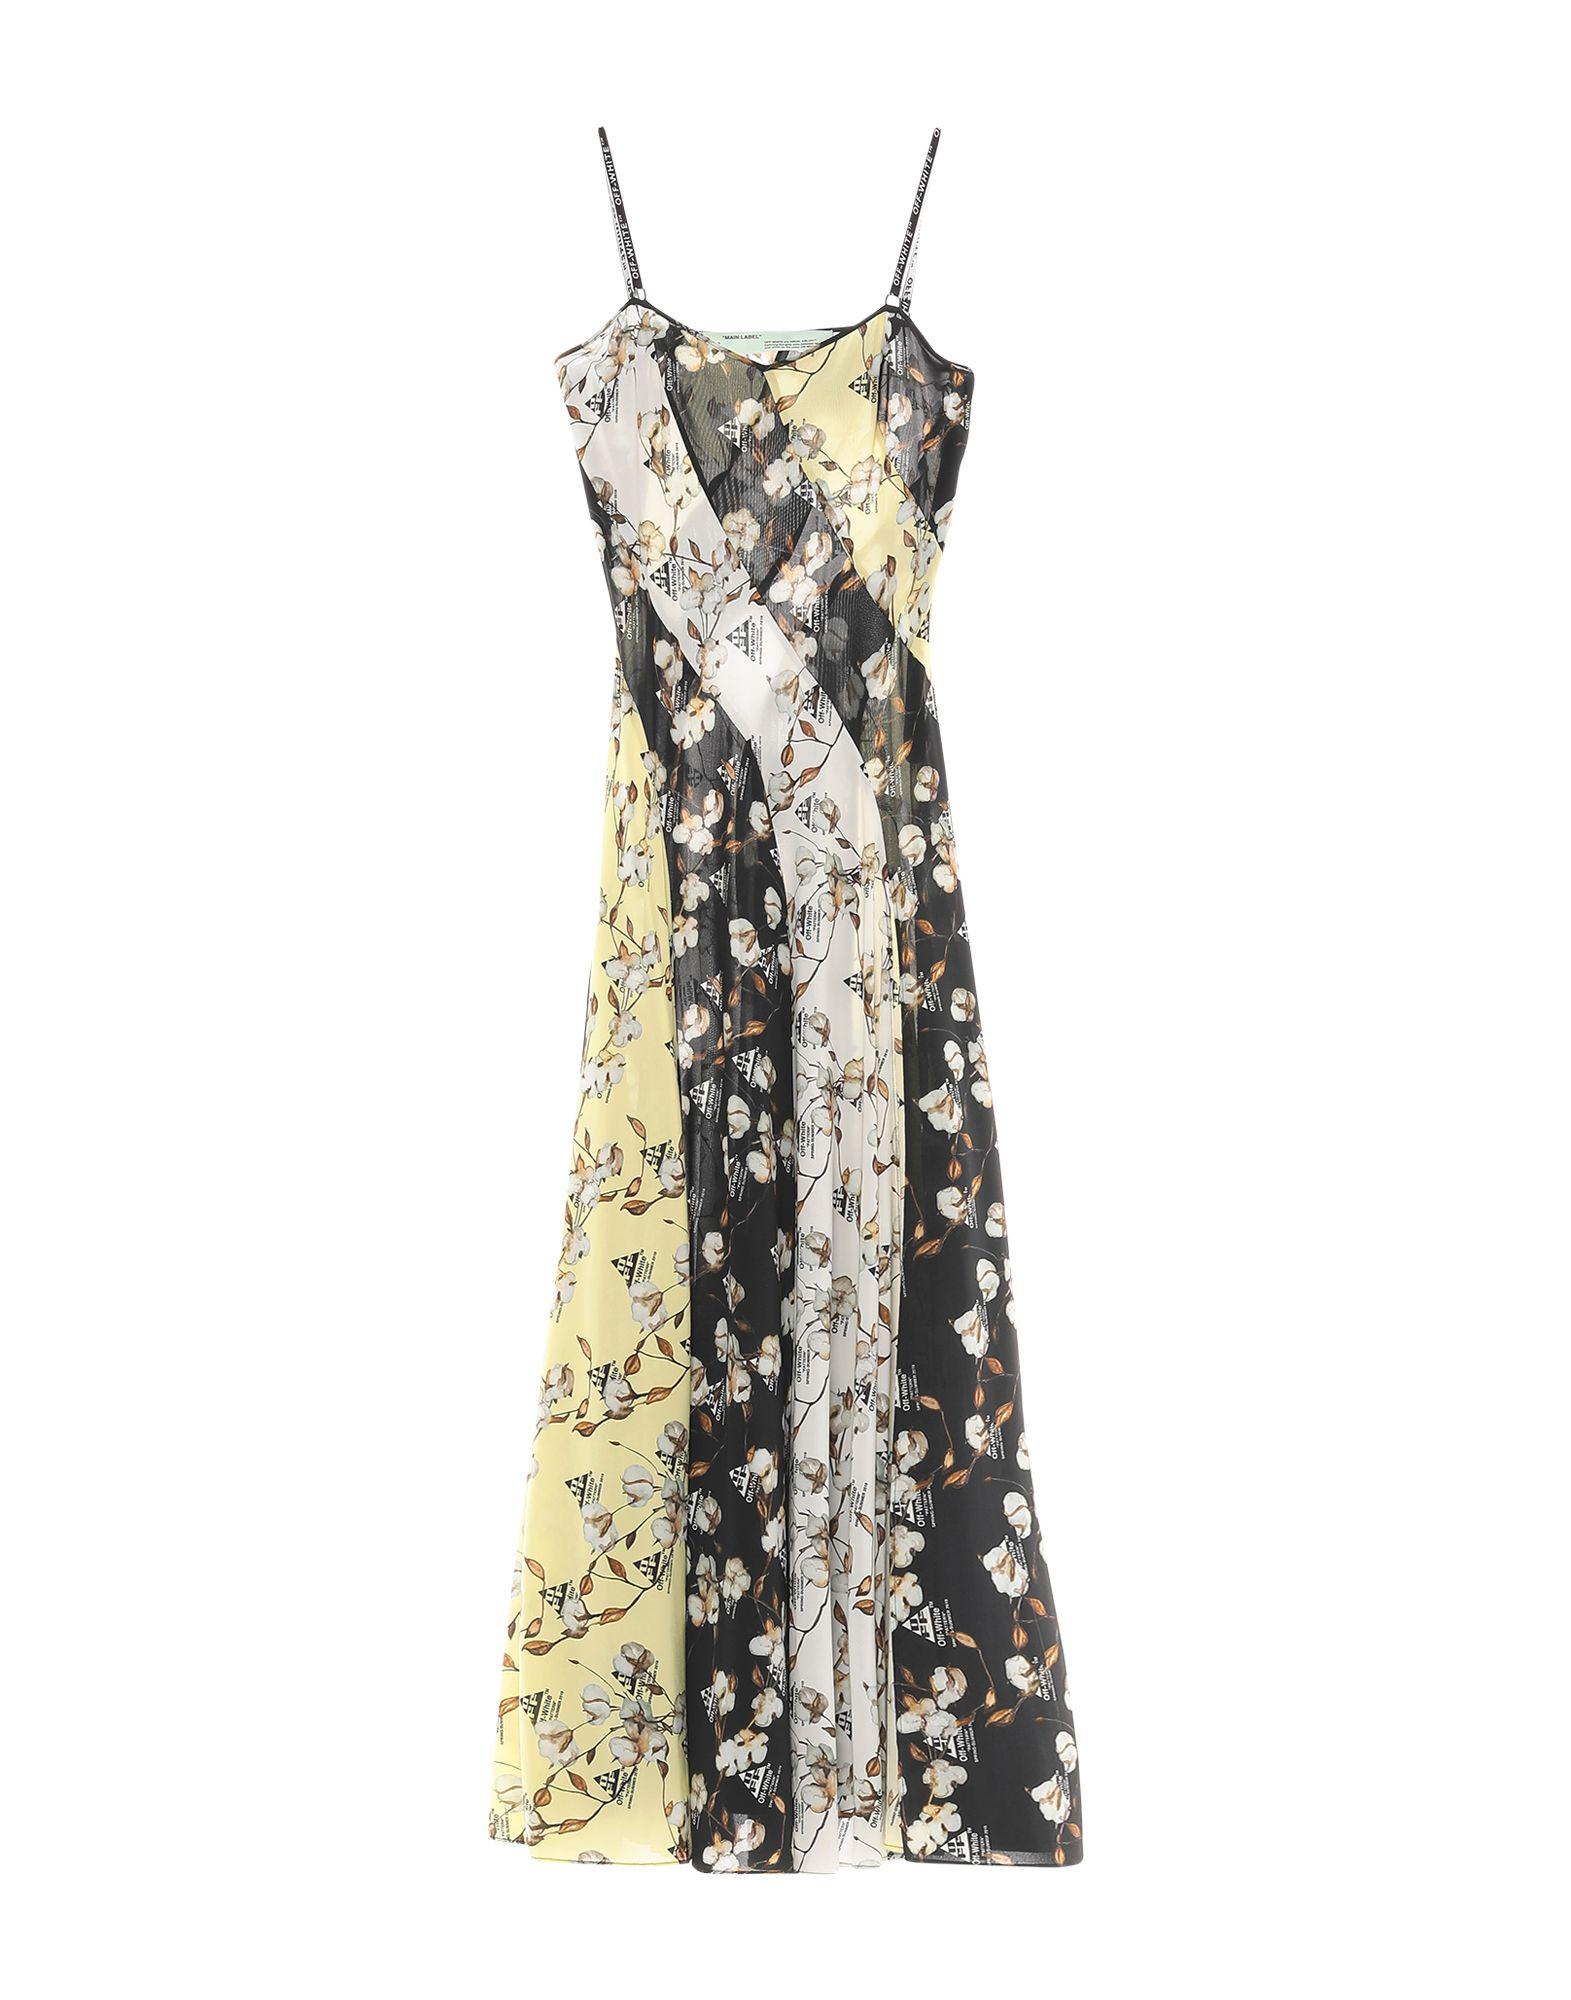 OFF-WHITE™ Long dresses. crepe, multicolor pattern, deep neckline, sleeveless, no pockets, side closure, zipper closure, unlined, stretch. 97% Viscose, 3% Elastane